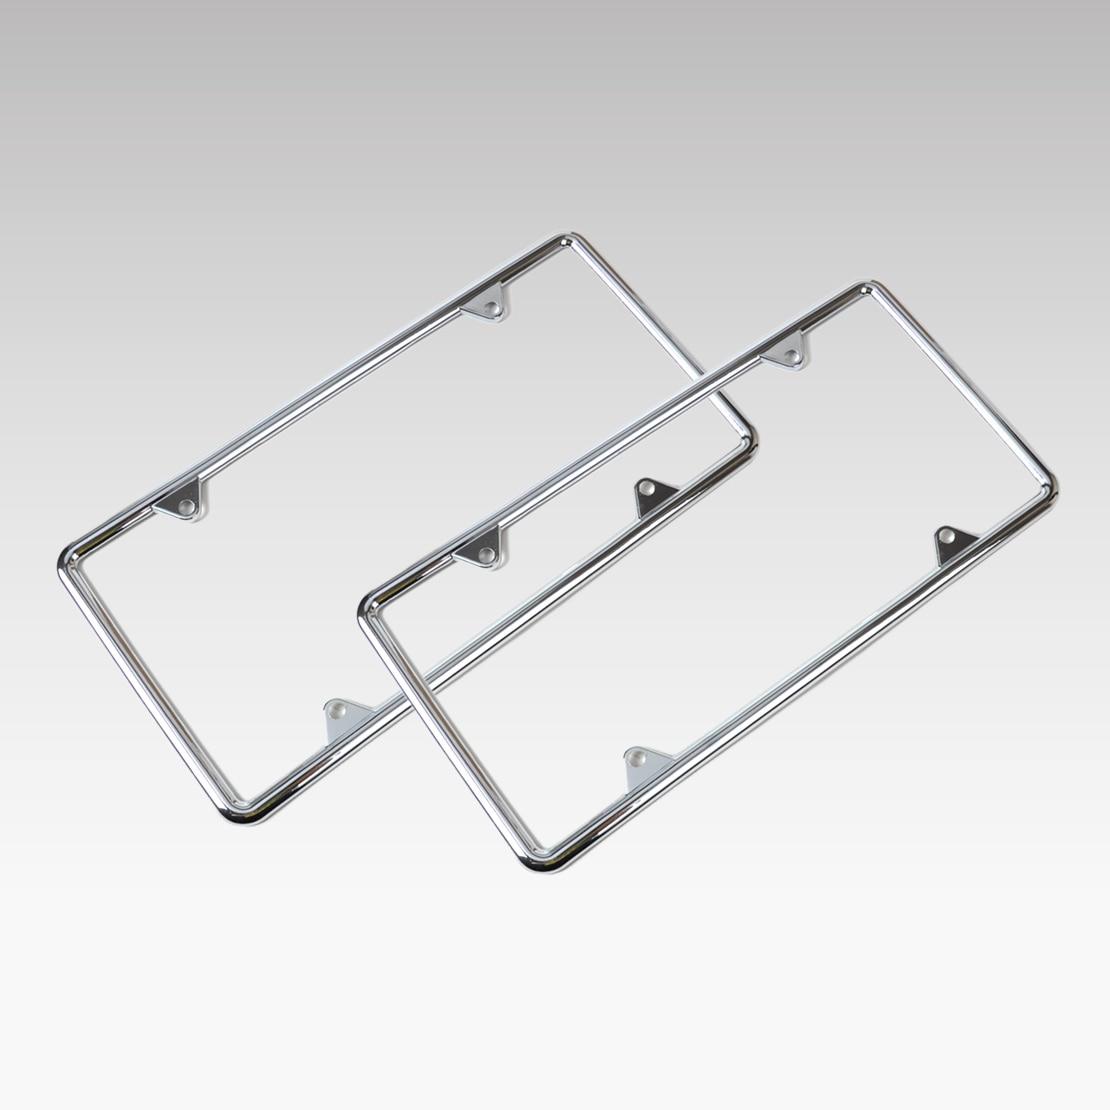 0 DWCX Chrome License Plate Frame Combination For Audi Q5 BMW F10 VW ...